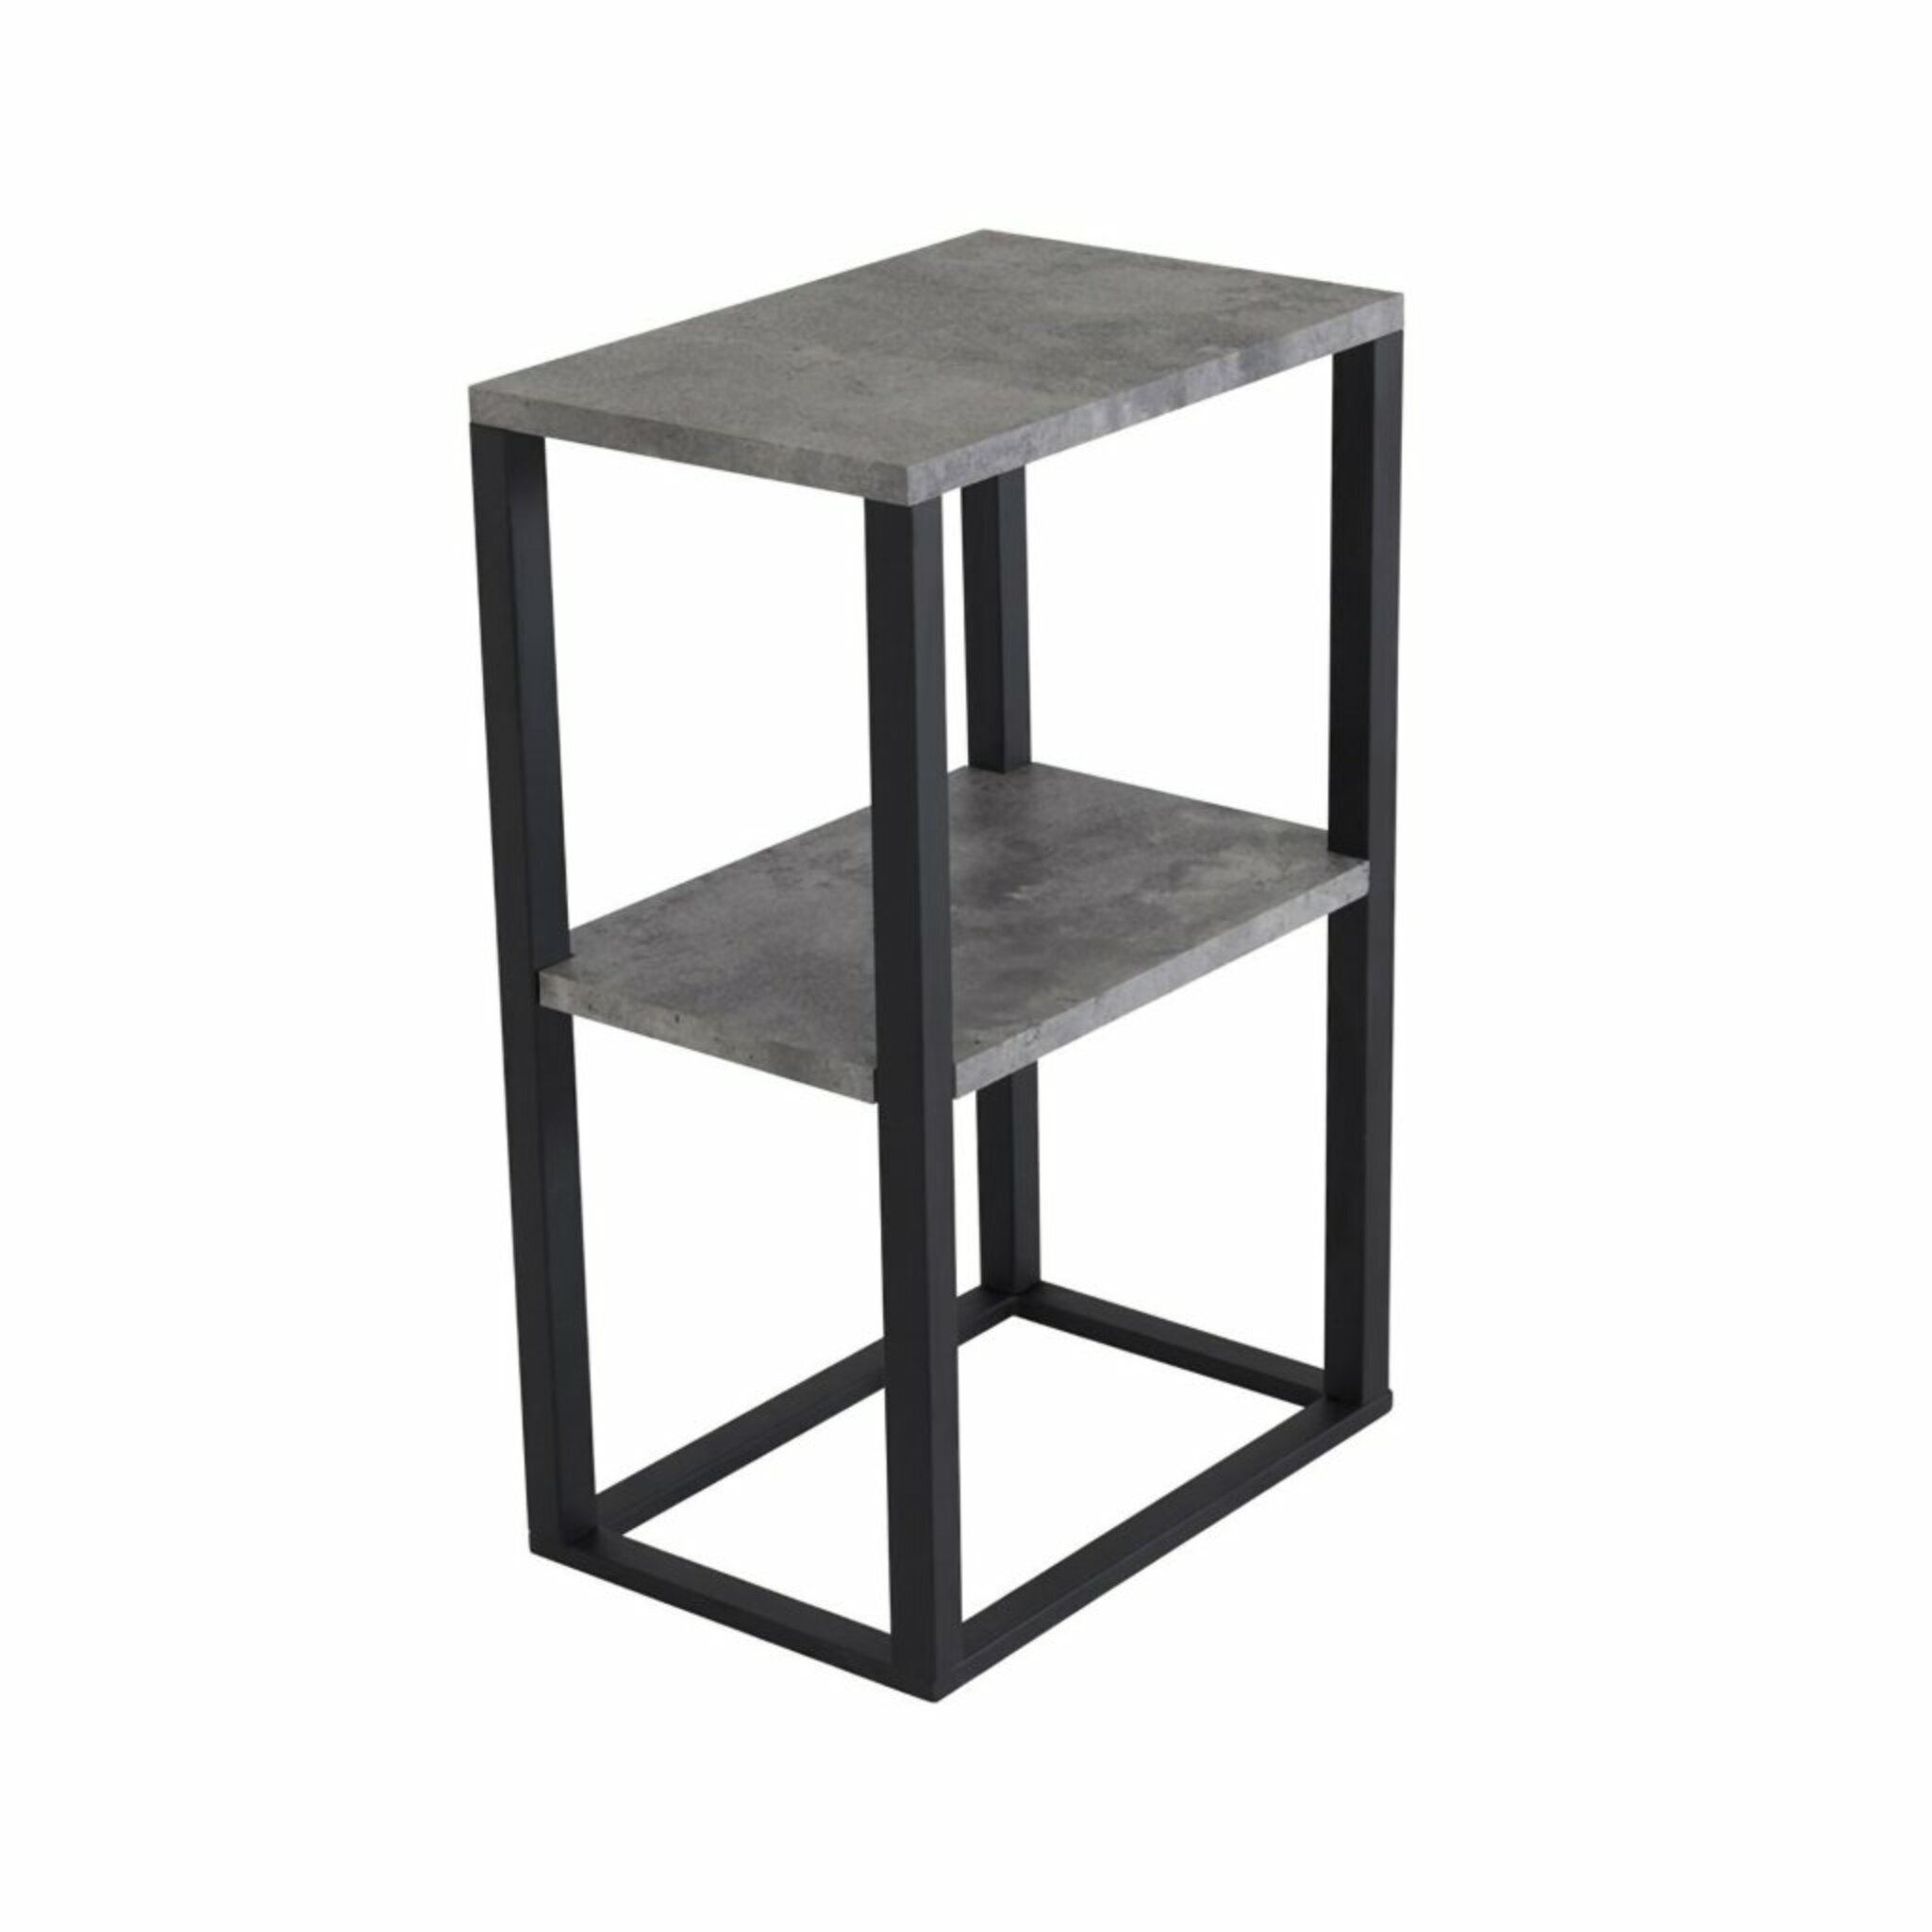 Sängbord Rise 45cm, svart/betong-look